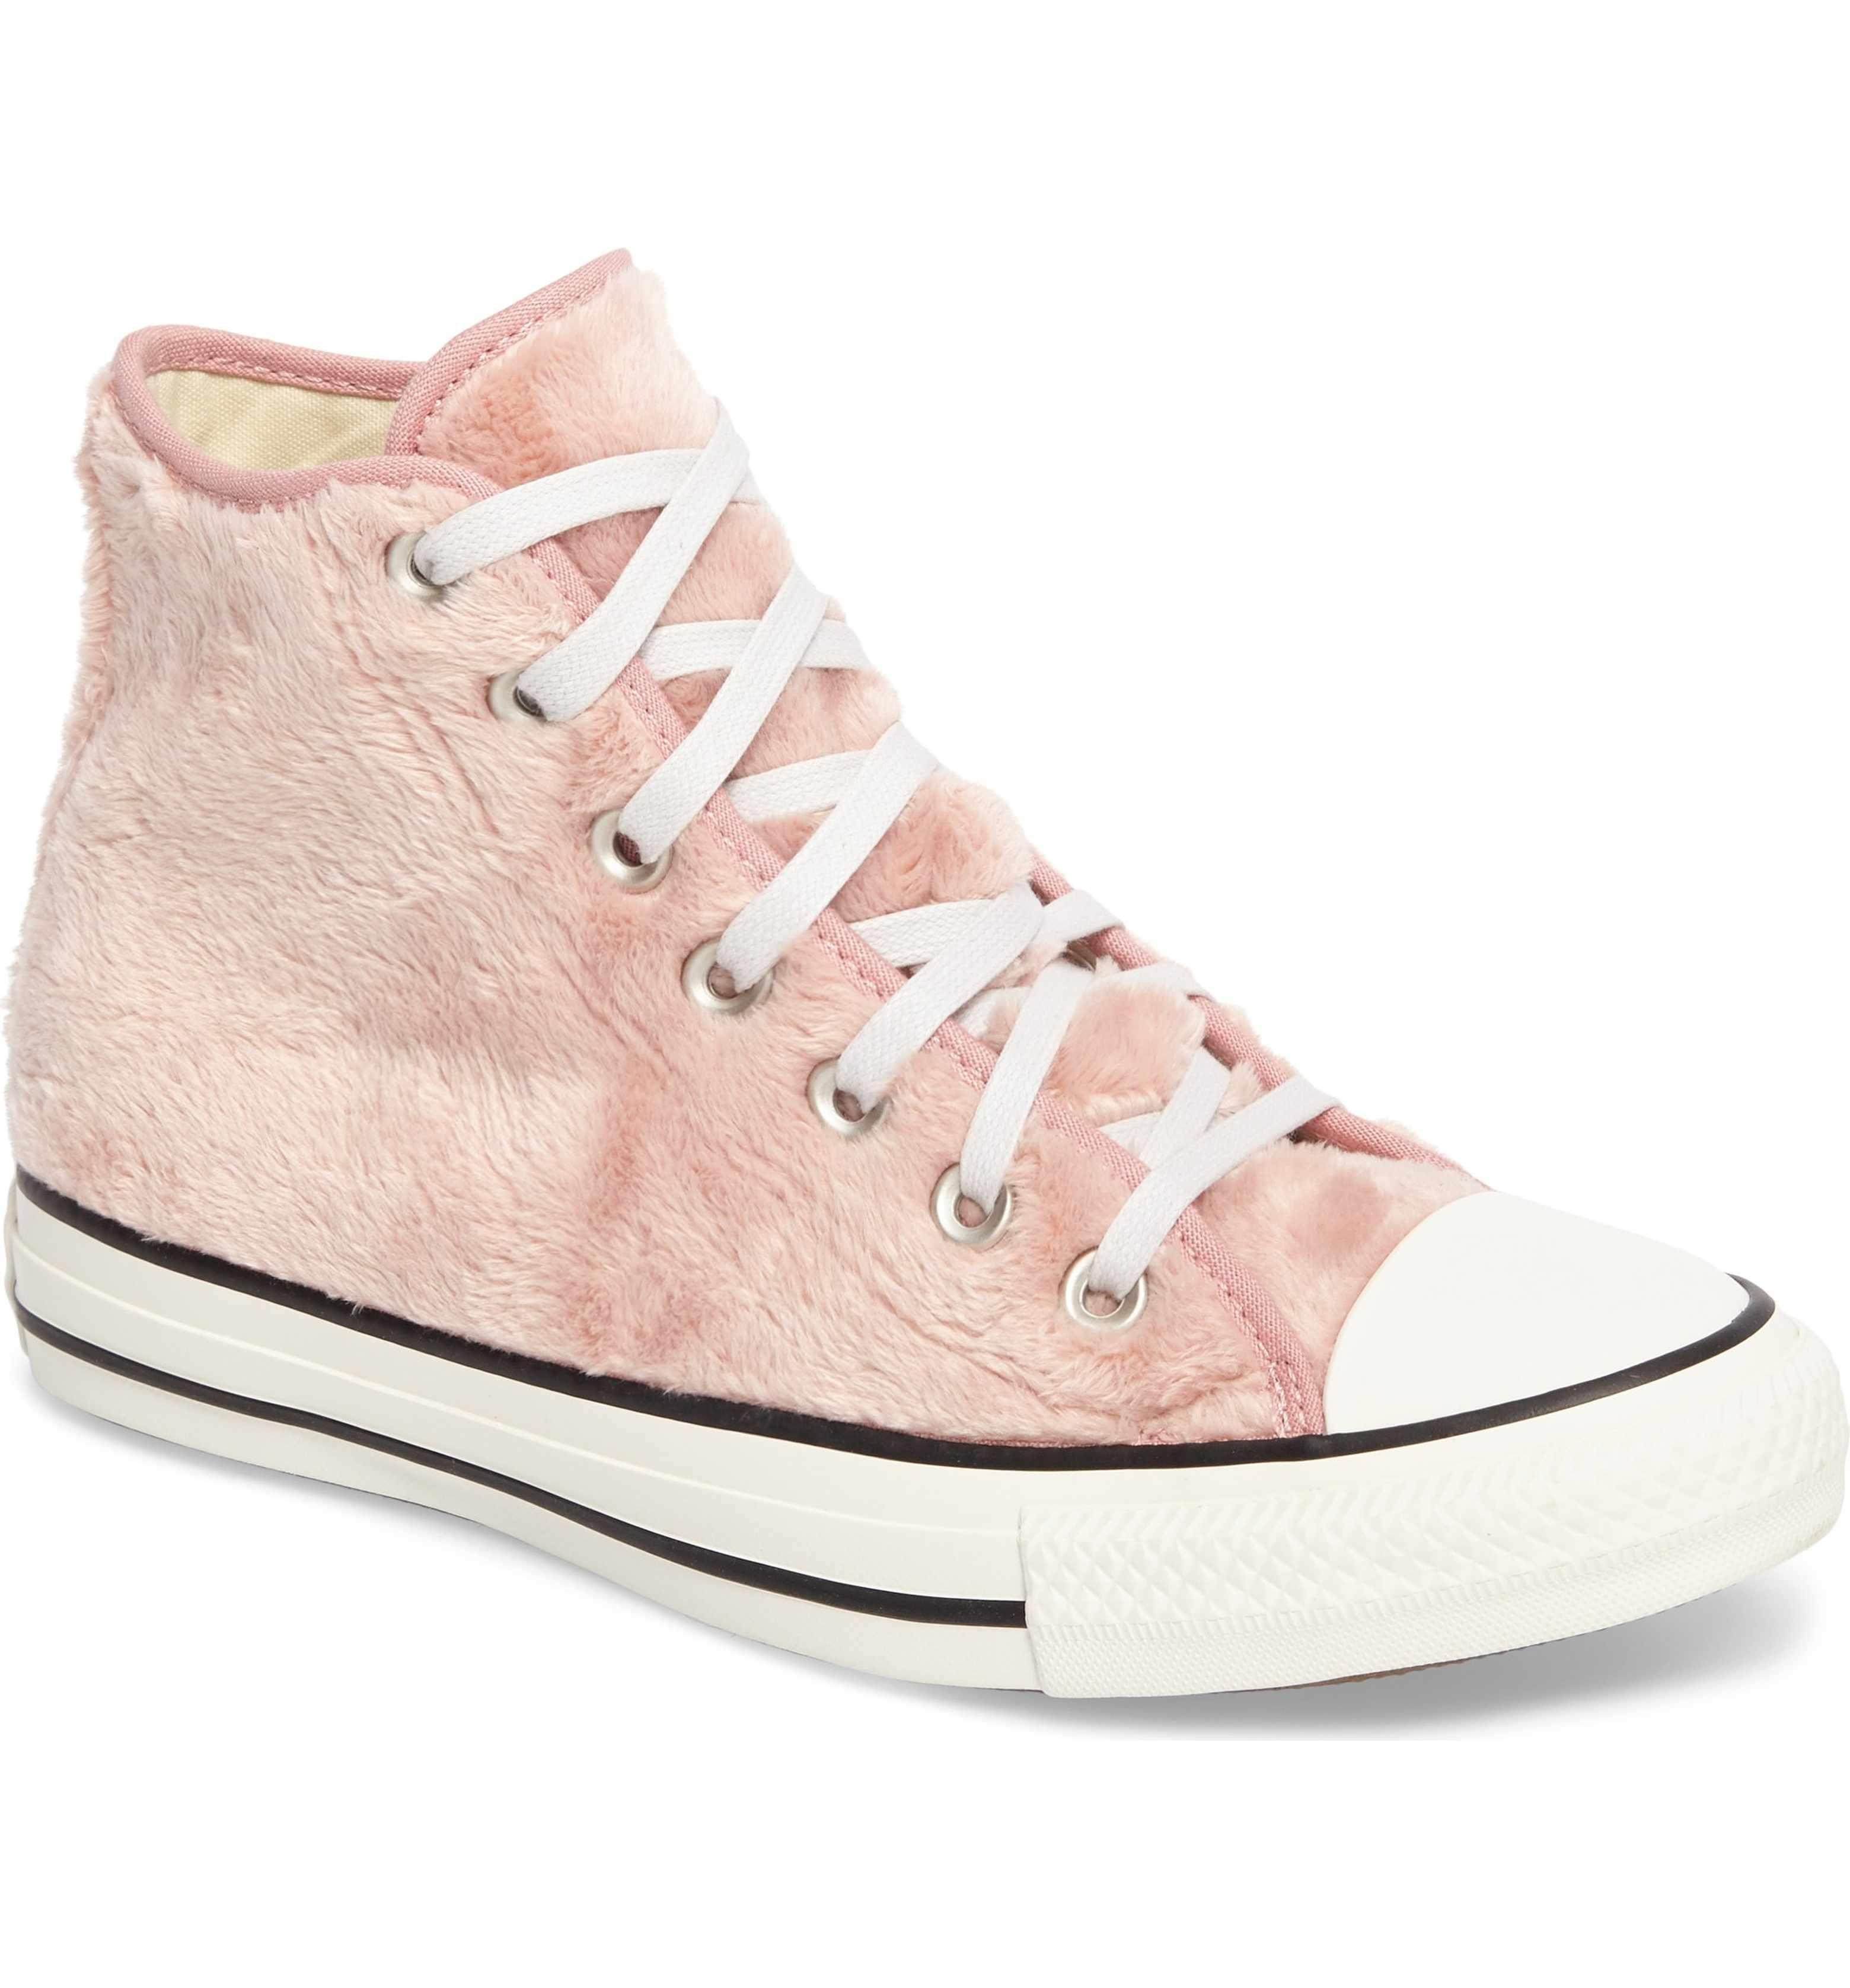 Faux Fur High Top Sneakers (Women